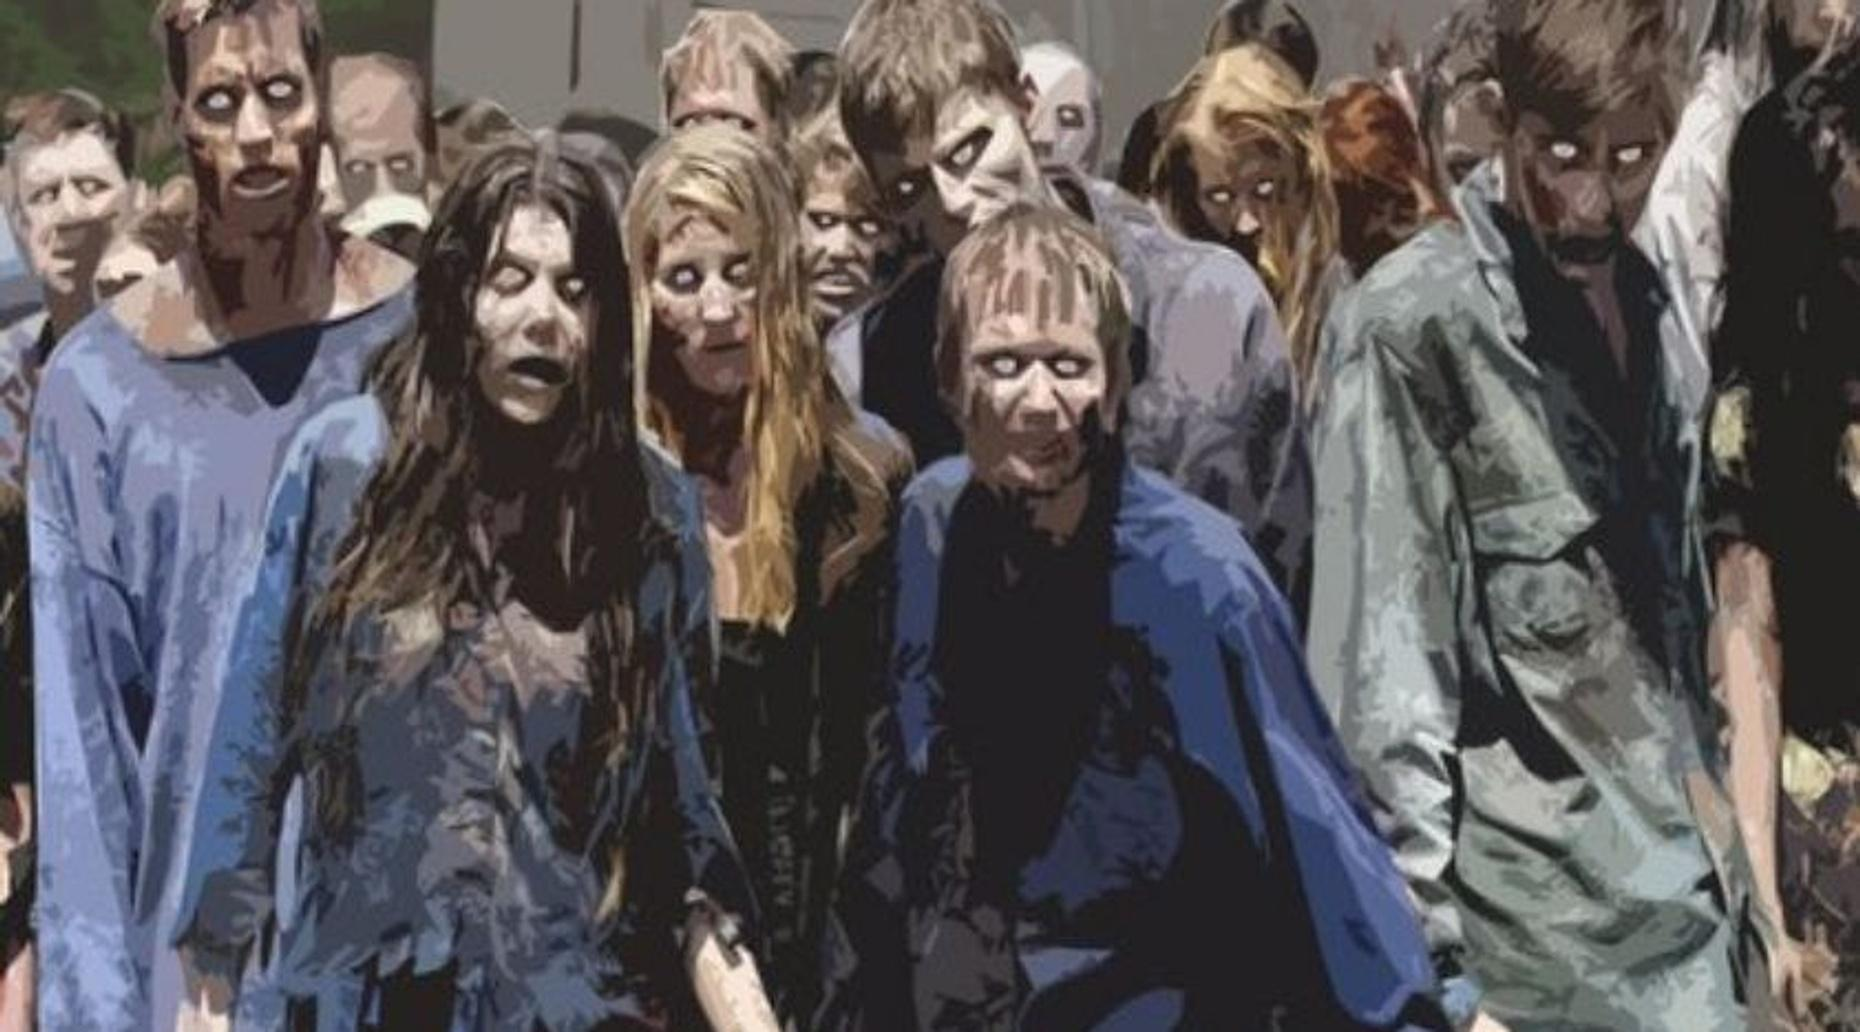 Zombie Apocalypse Escape Room in Omaha